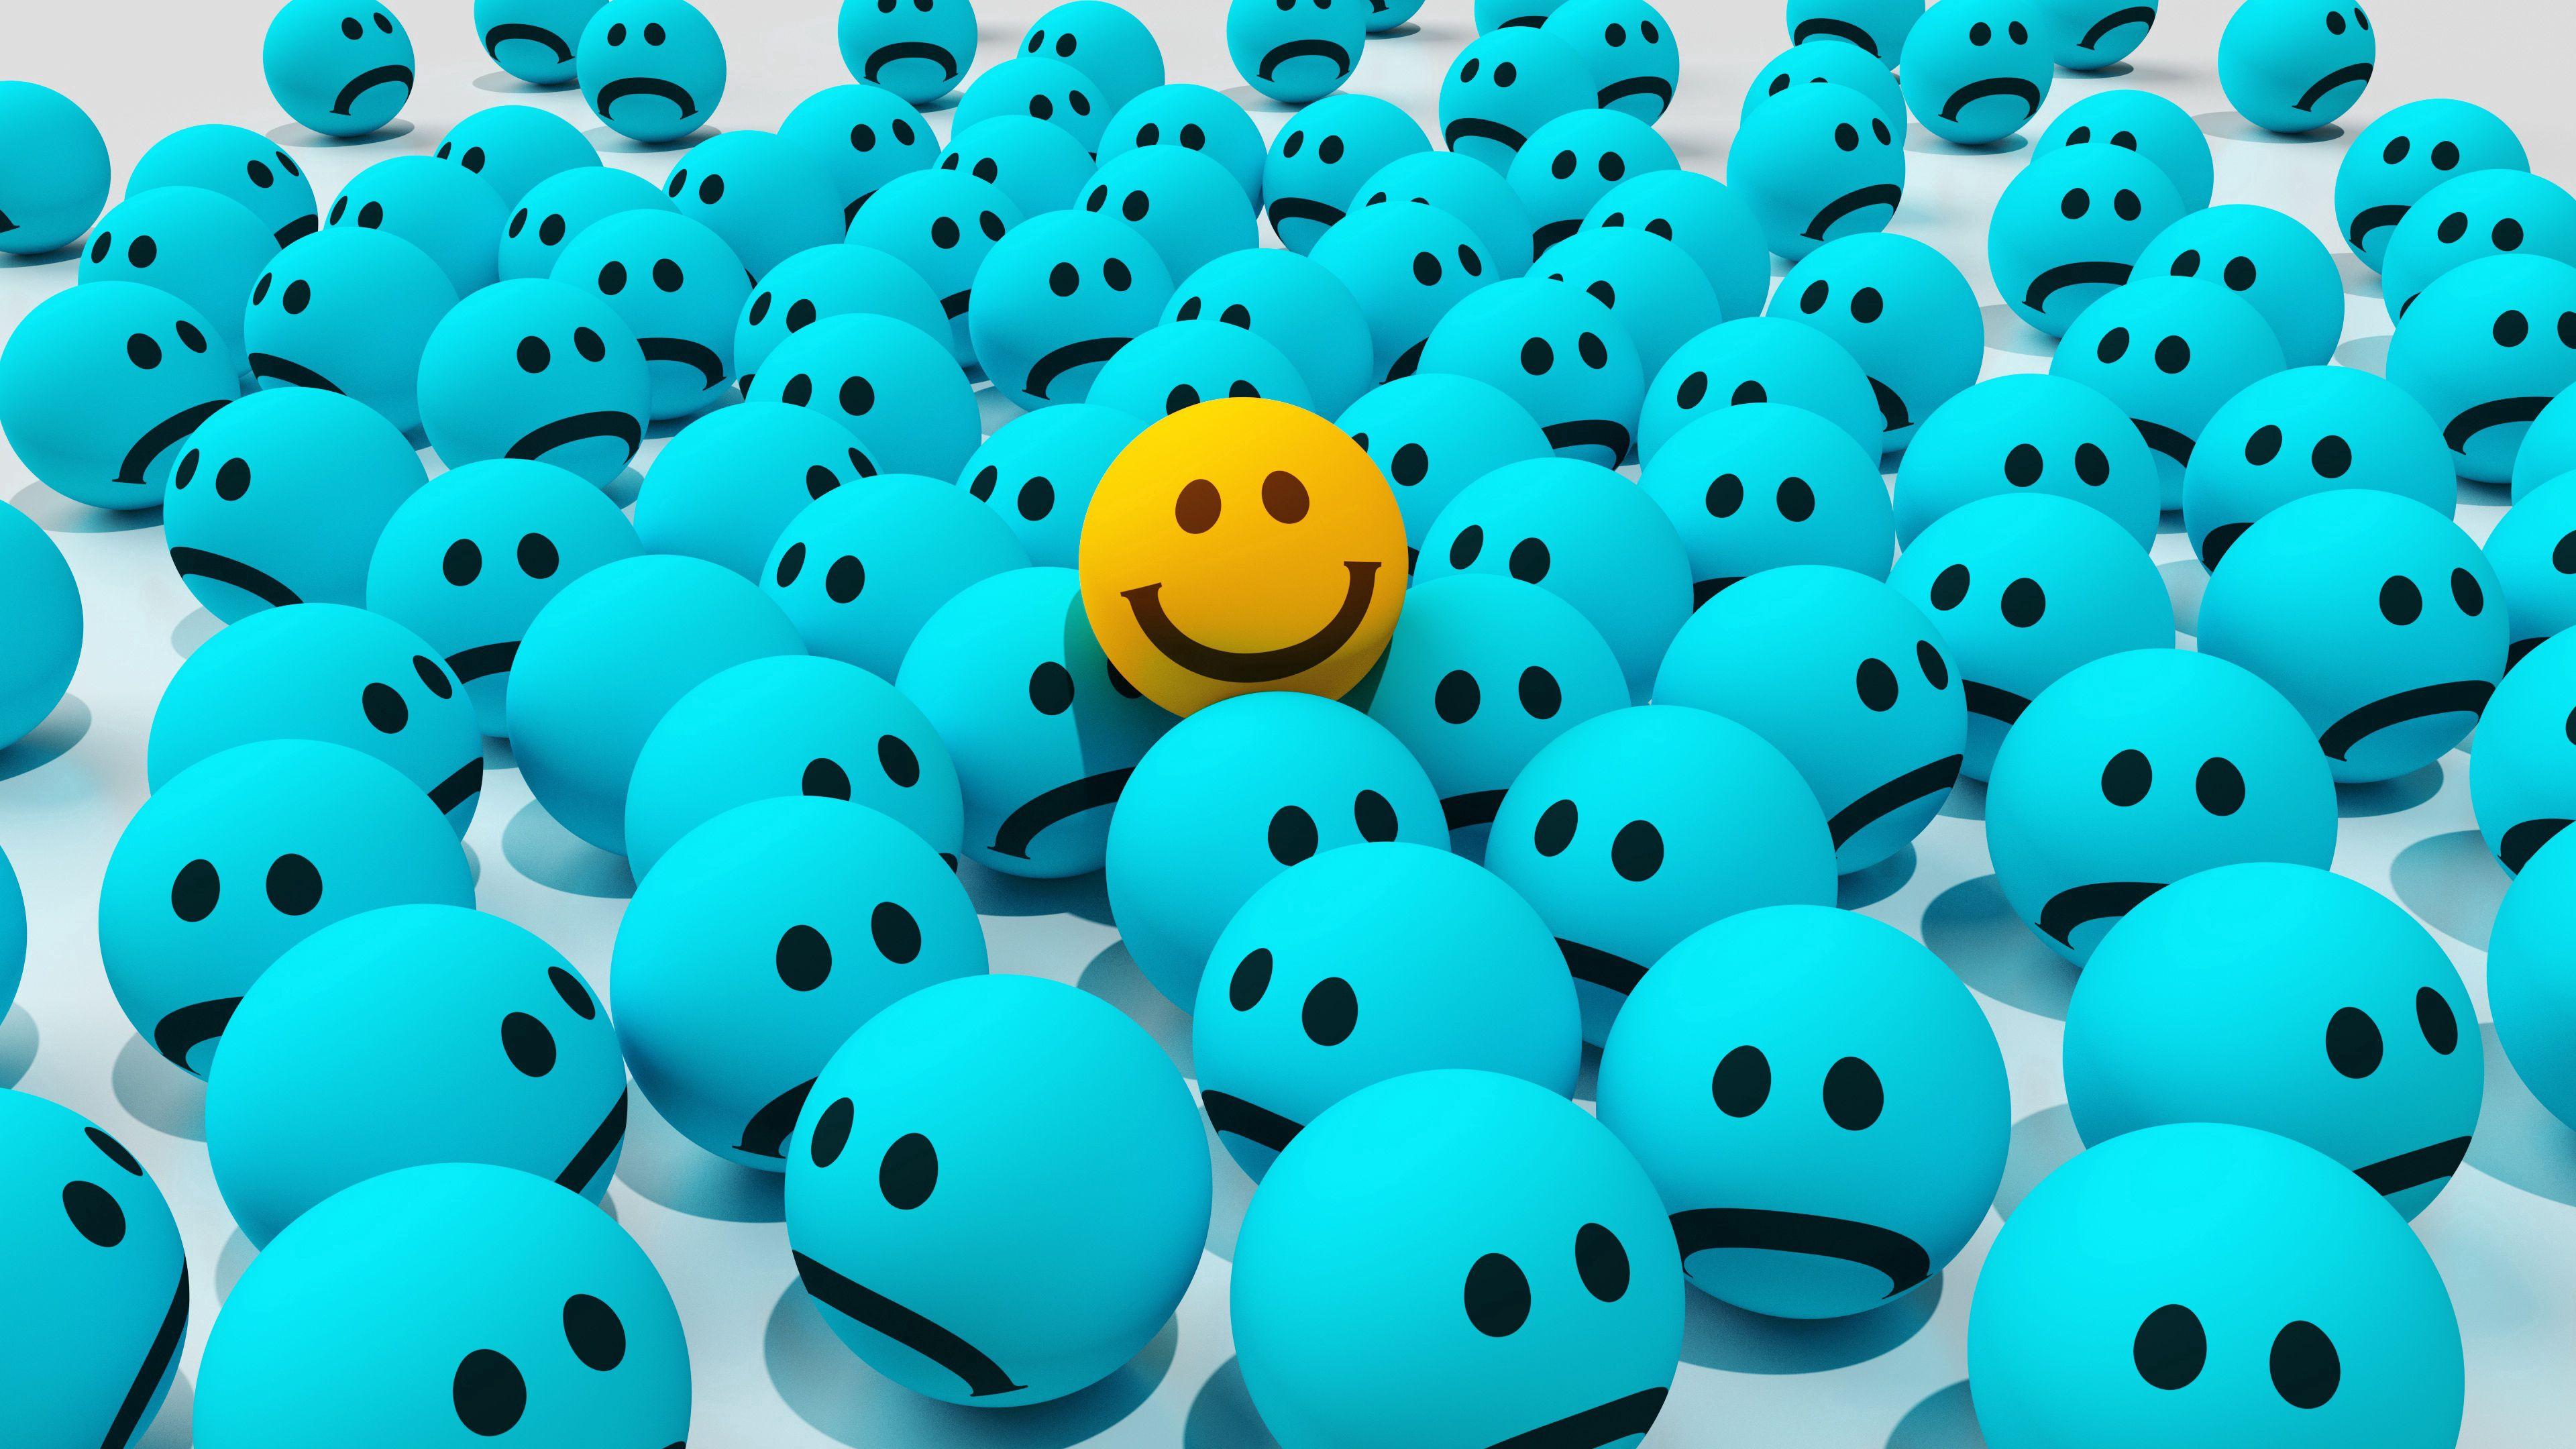 download wallpaper 3840x2160 smiles, joy, sadness hd background